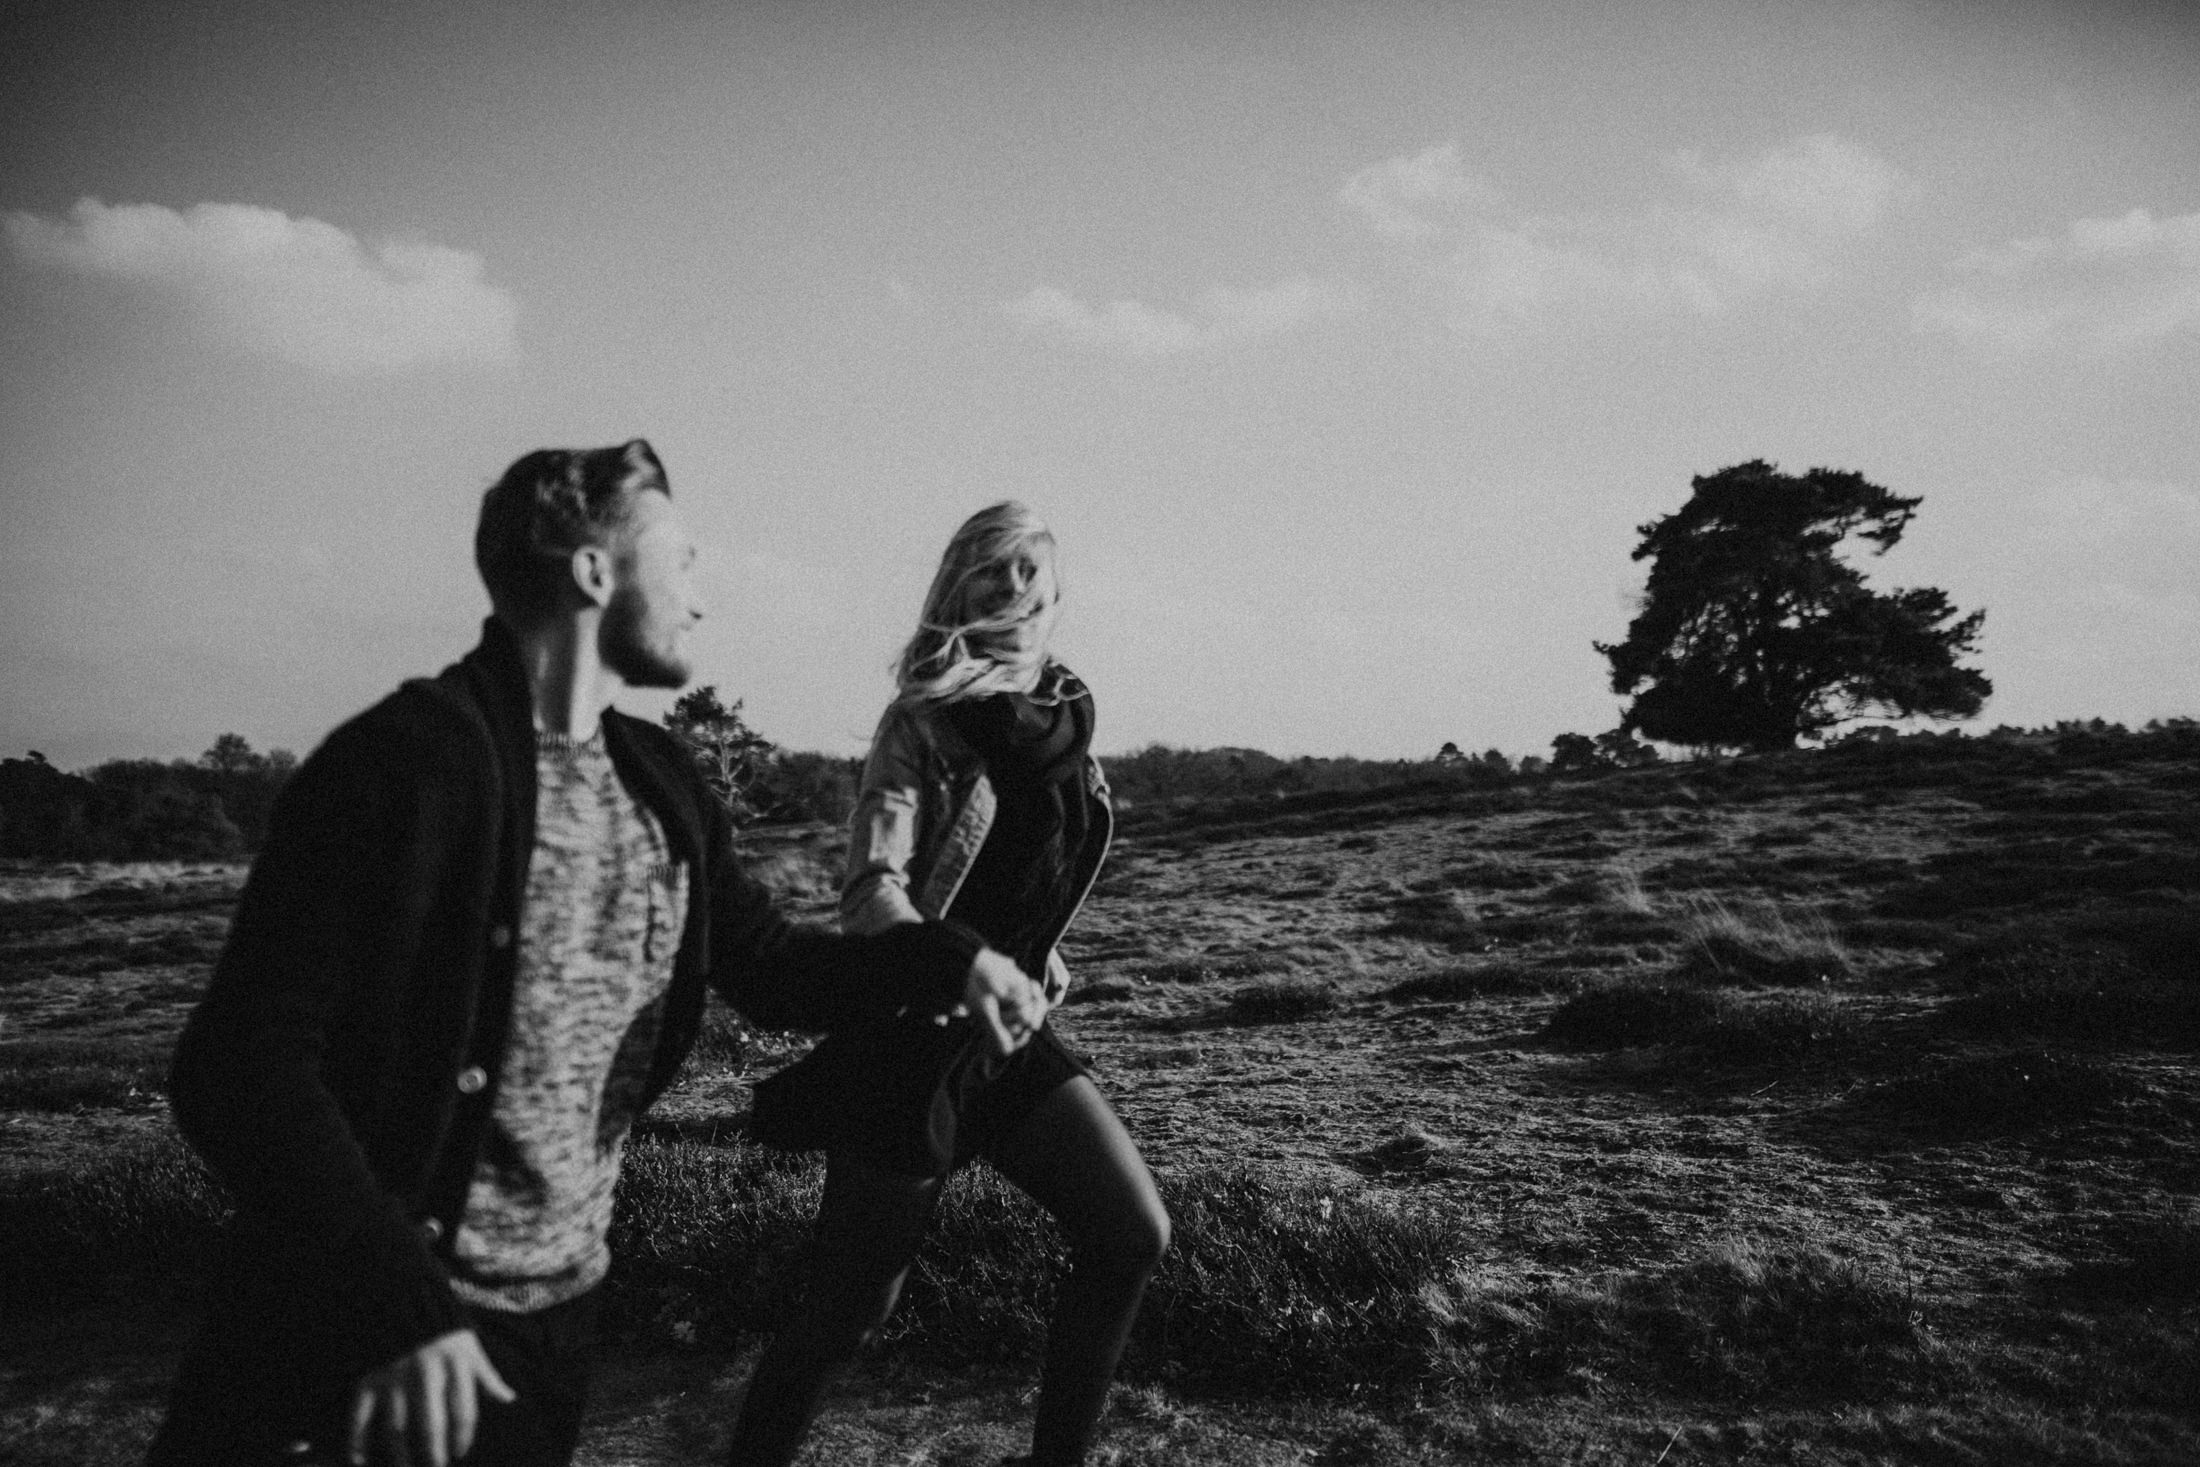 Wedding_Photographer_Mallorca_Daniela-Marquardt_Photography_CanaryIslands_Lanzarote_Iceland_Tuskany_Santorini_Portugal__Austria_Elopement_Hochzeitsfotograf_Milena_Marvin_16